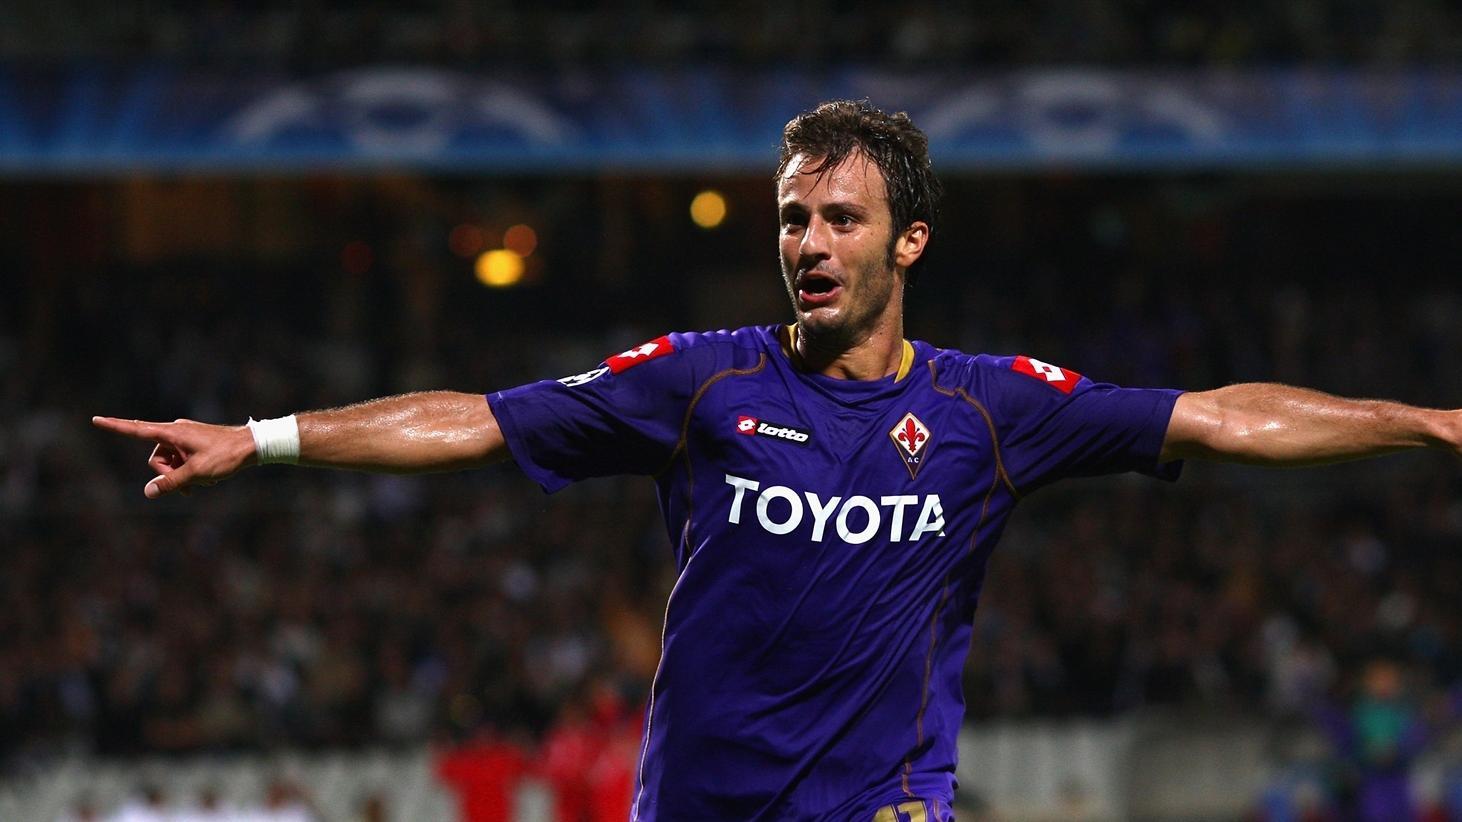 Gilardino raises Viola expectations | UEFA Champions League | UEFA.com